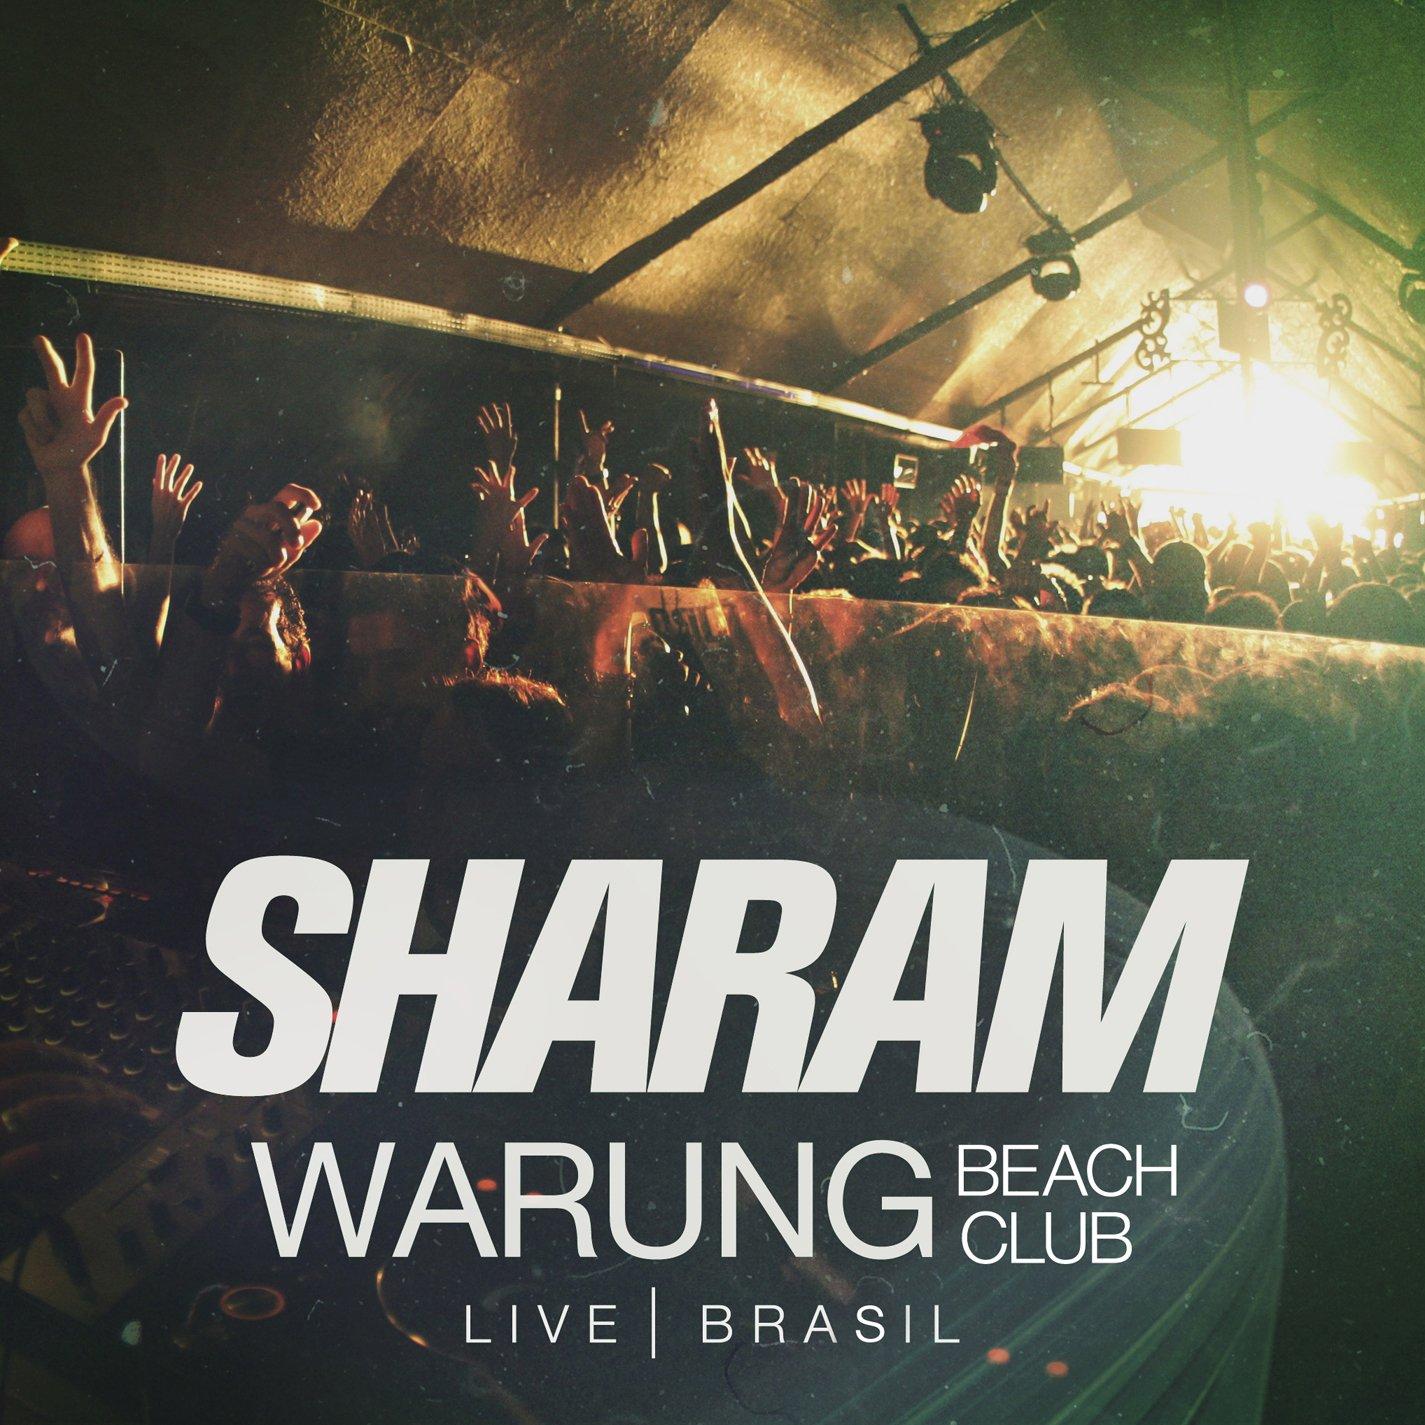 Live at Warung Beach Club Brasil by Yoshitoshi Recordings, Inc.